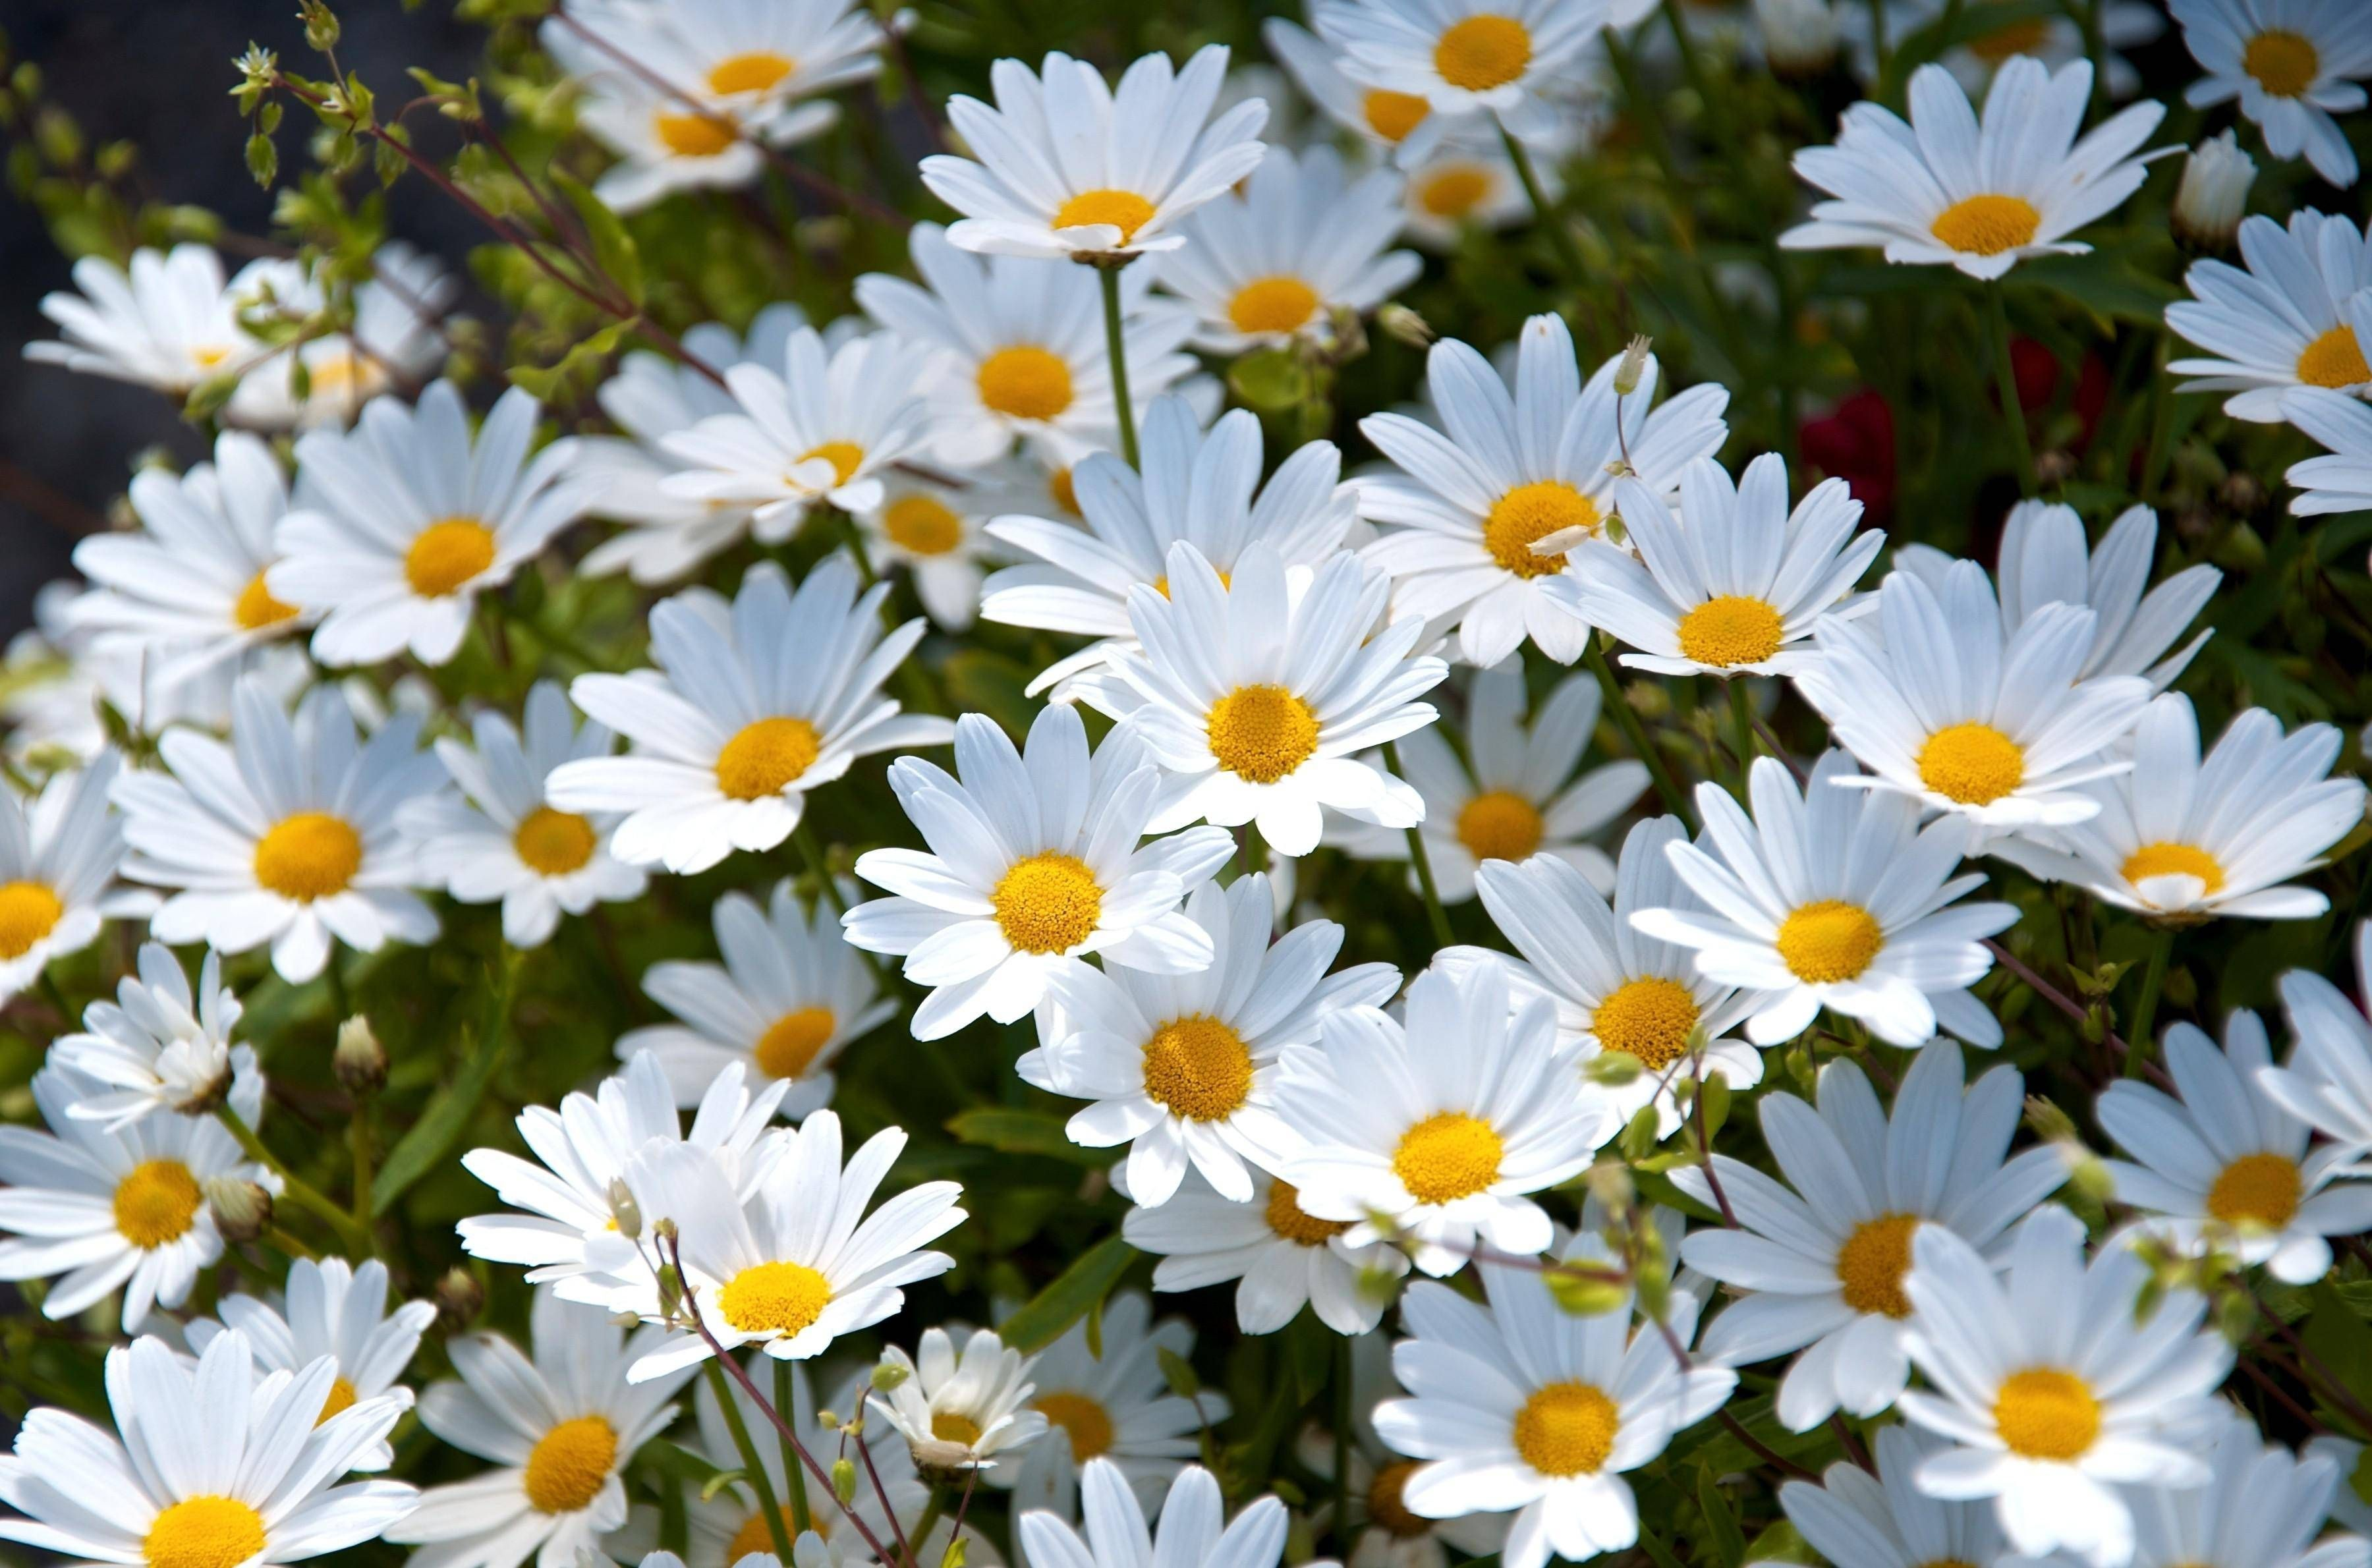 Image: flowers, chamomiles, many, white, petals